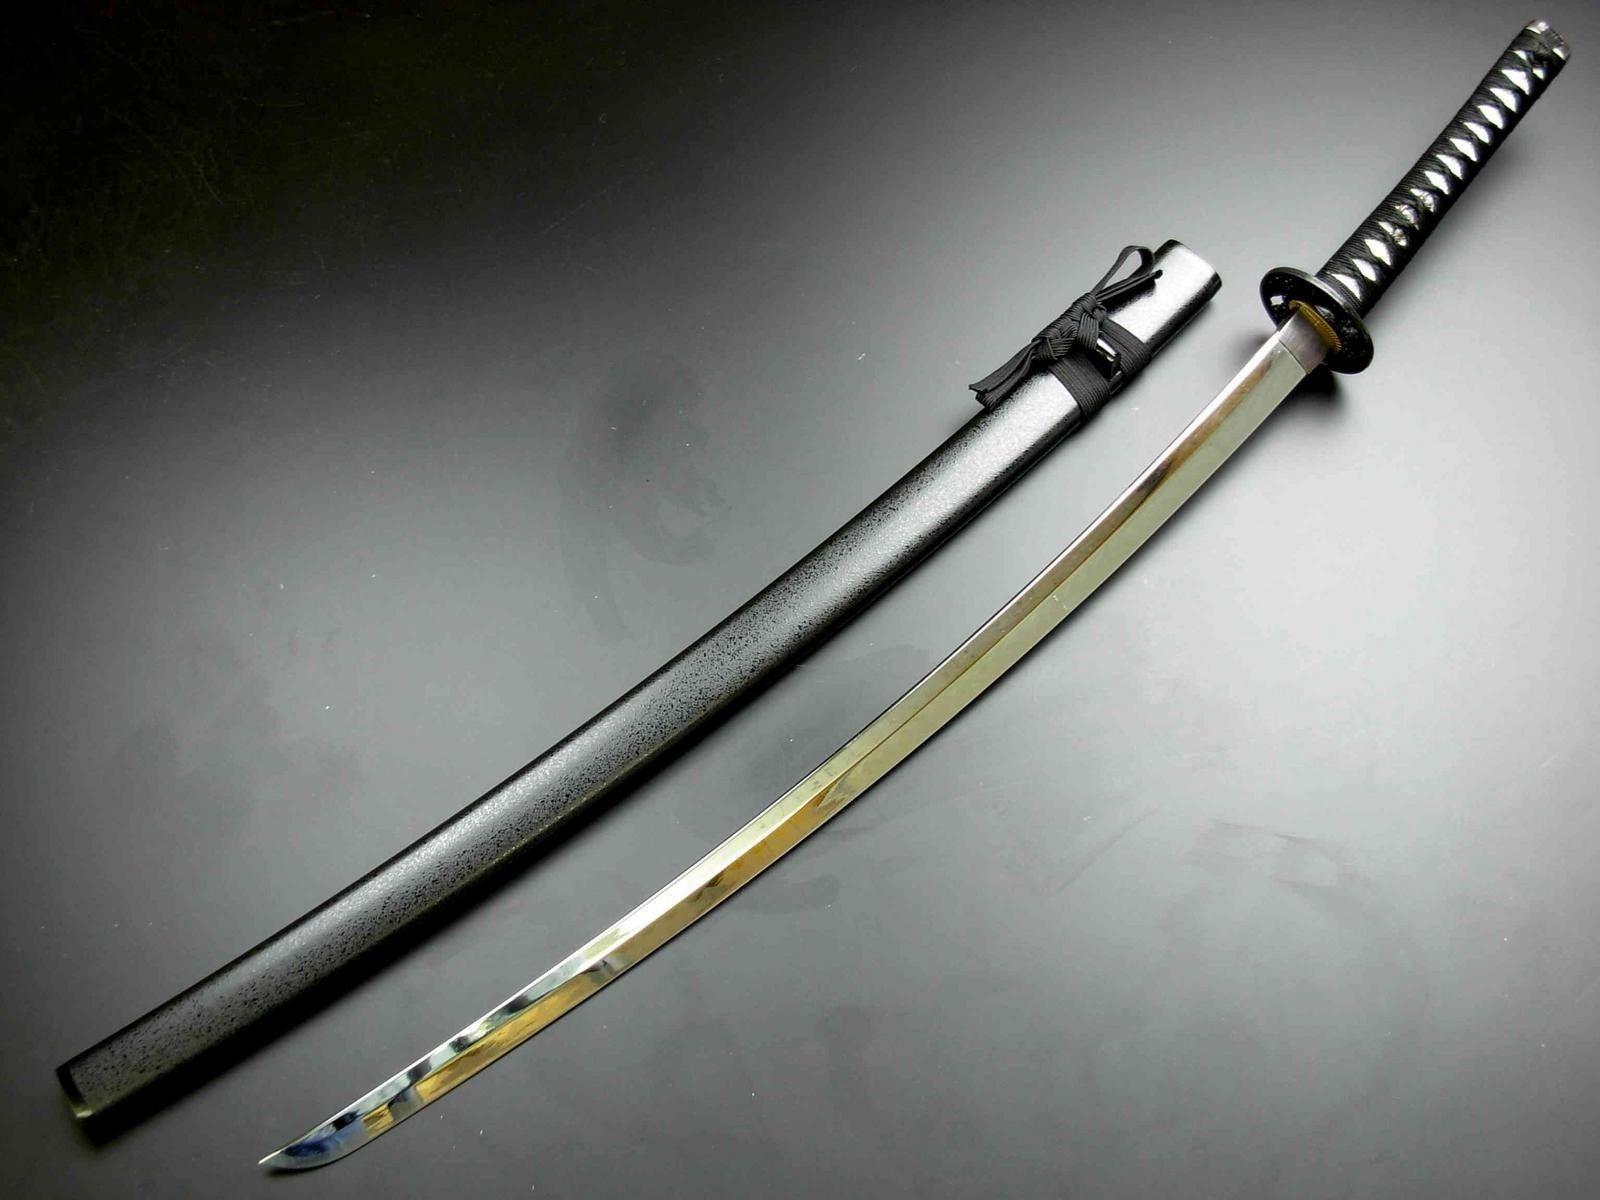 Samurai Sword Wallpaper Samurai Swords Sword Katana